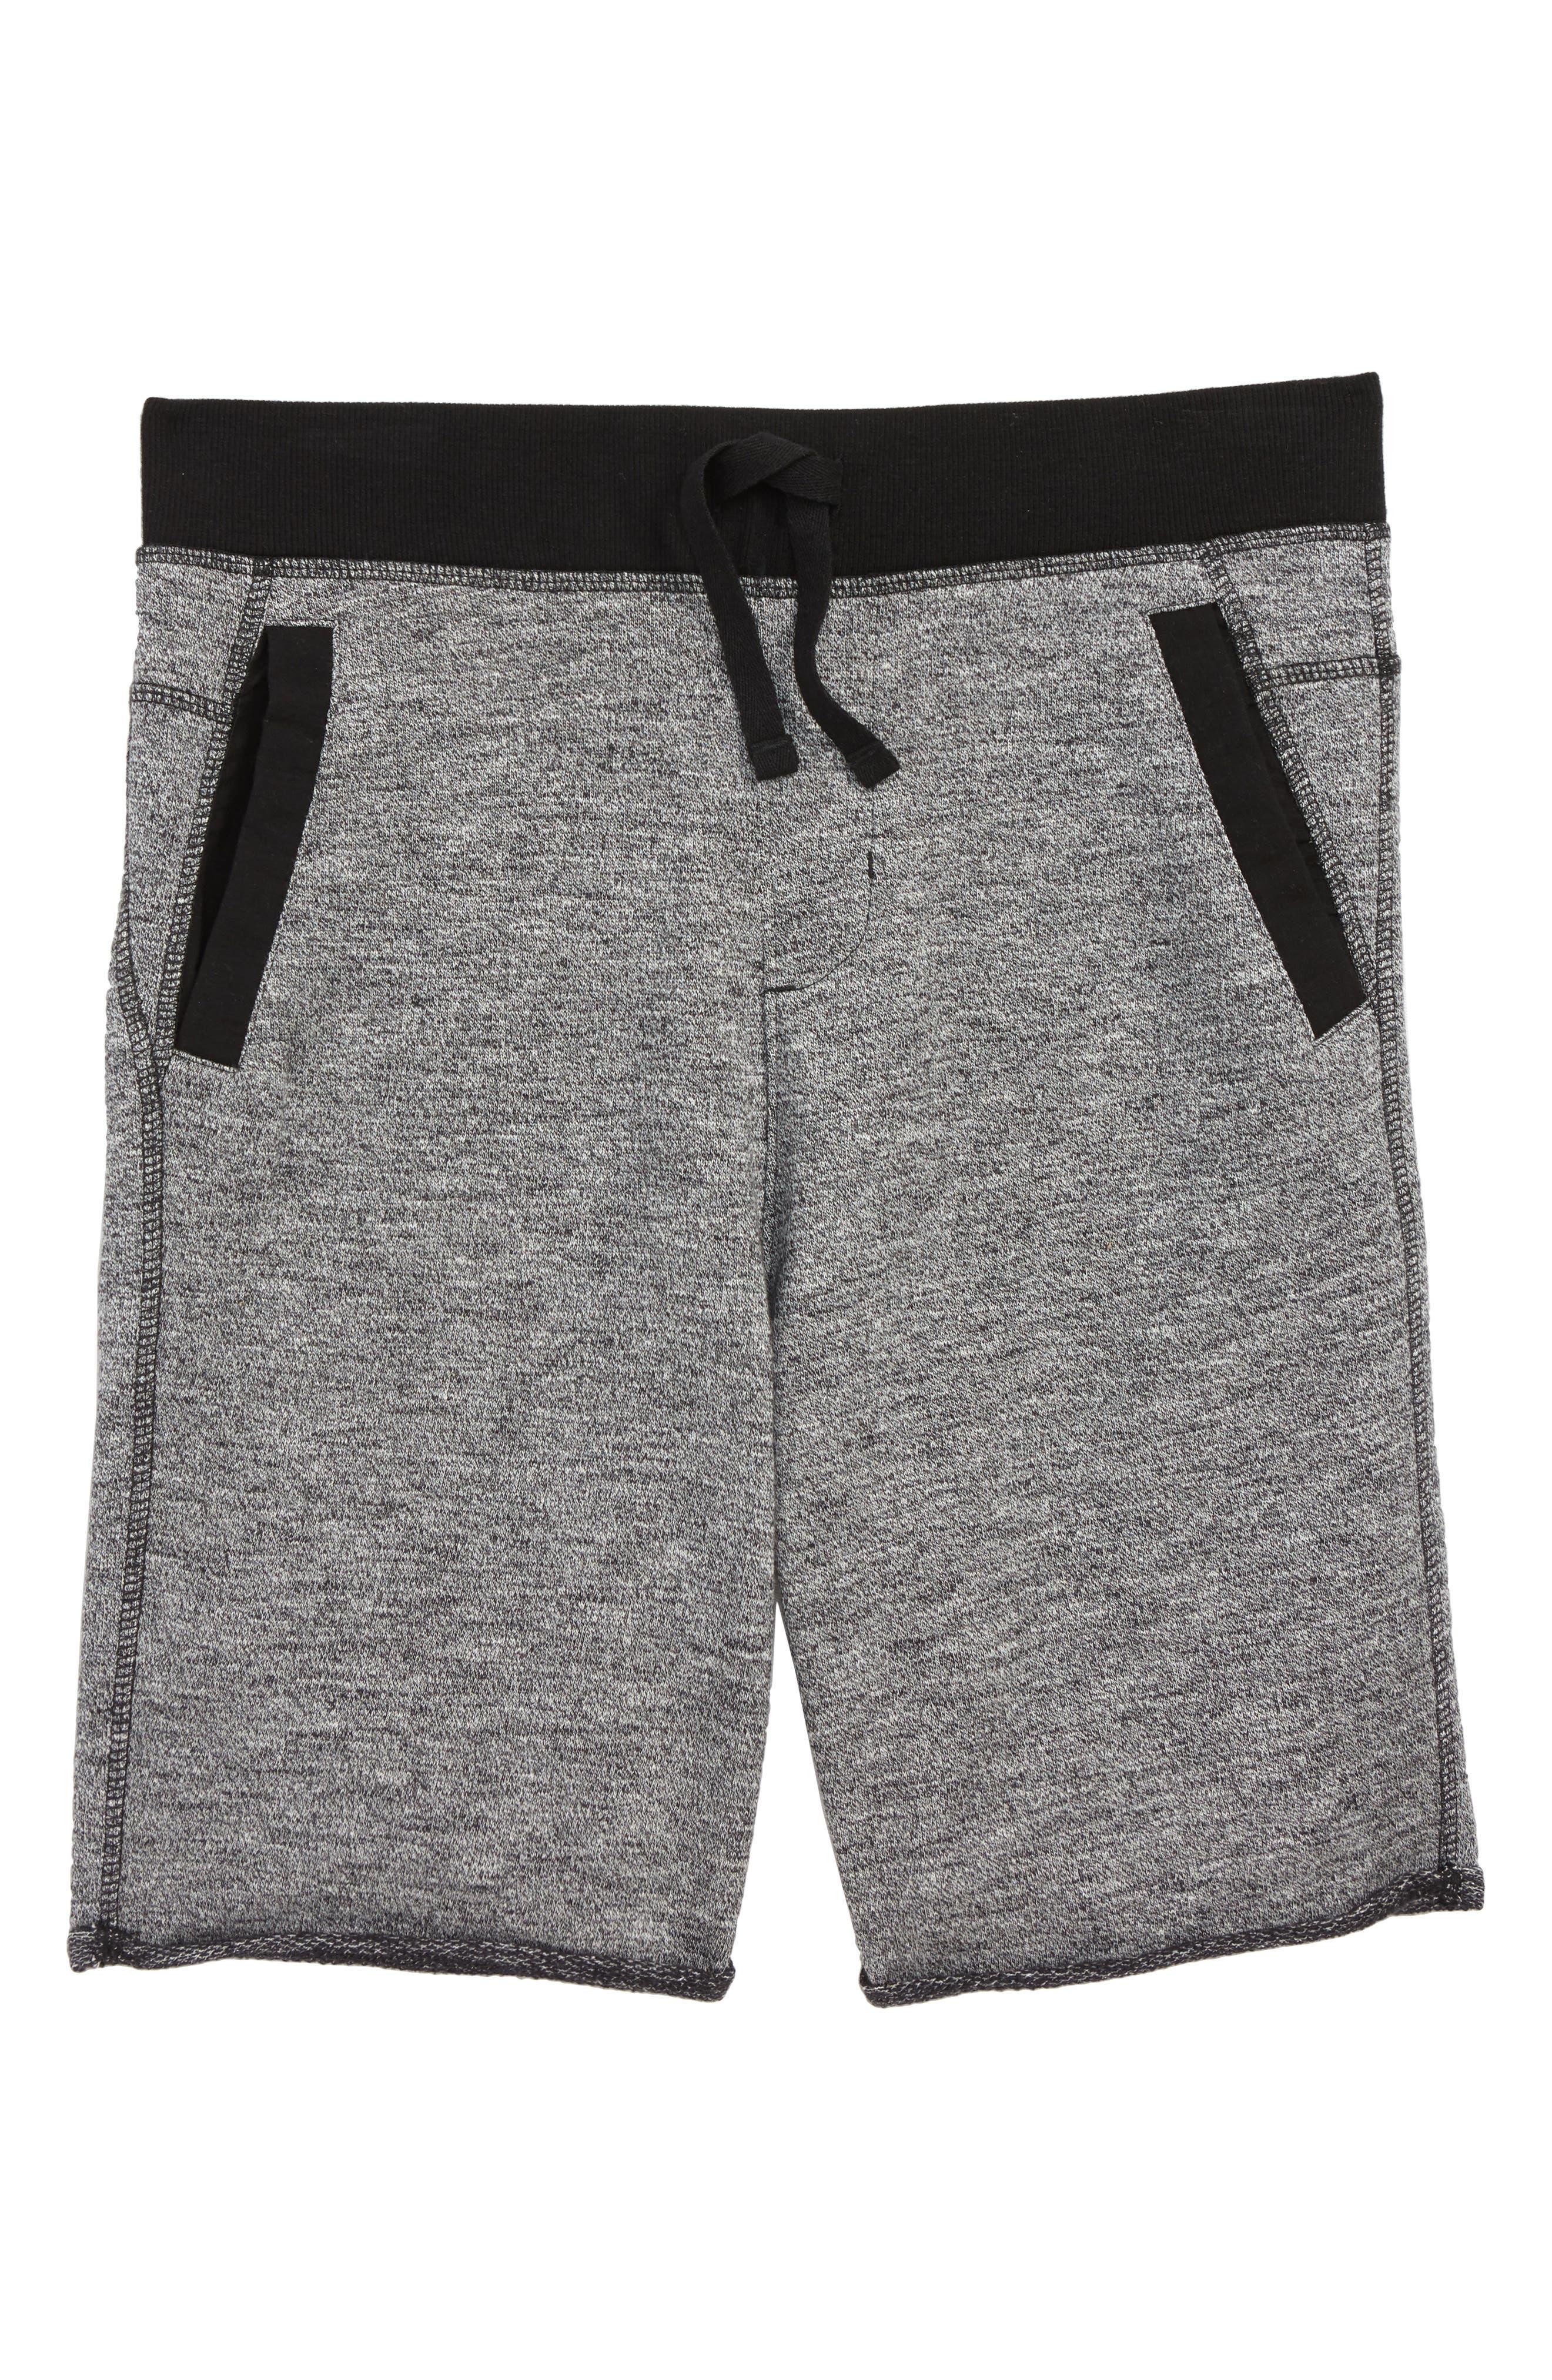 Fleece Knit Shorts,                         Main,                         color, 030